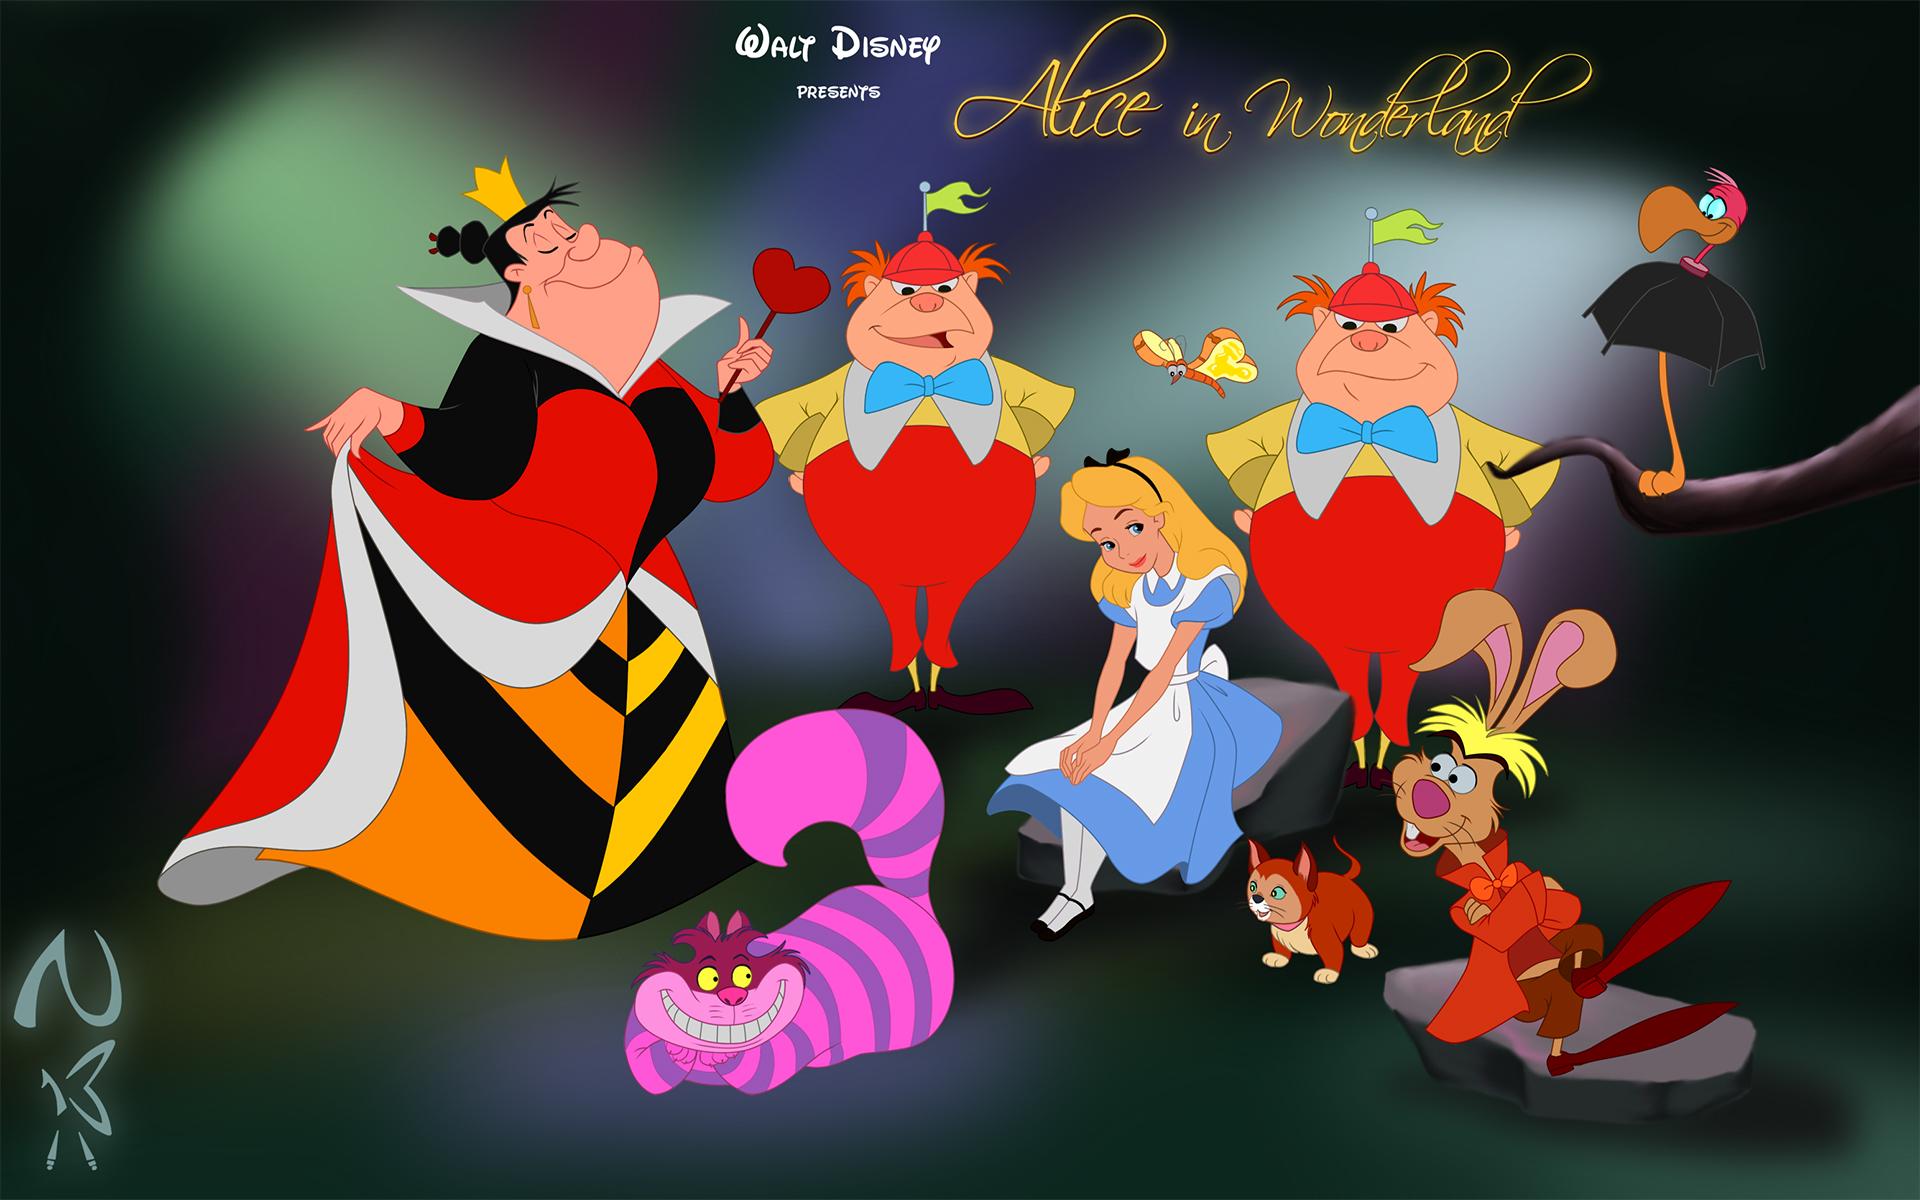 Free Download Cartoon Alice In Wonderland Wallpaper Hd Walls Find